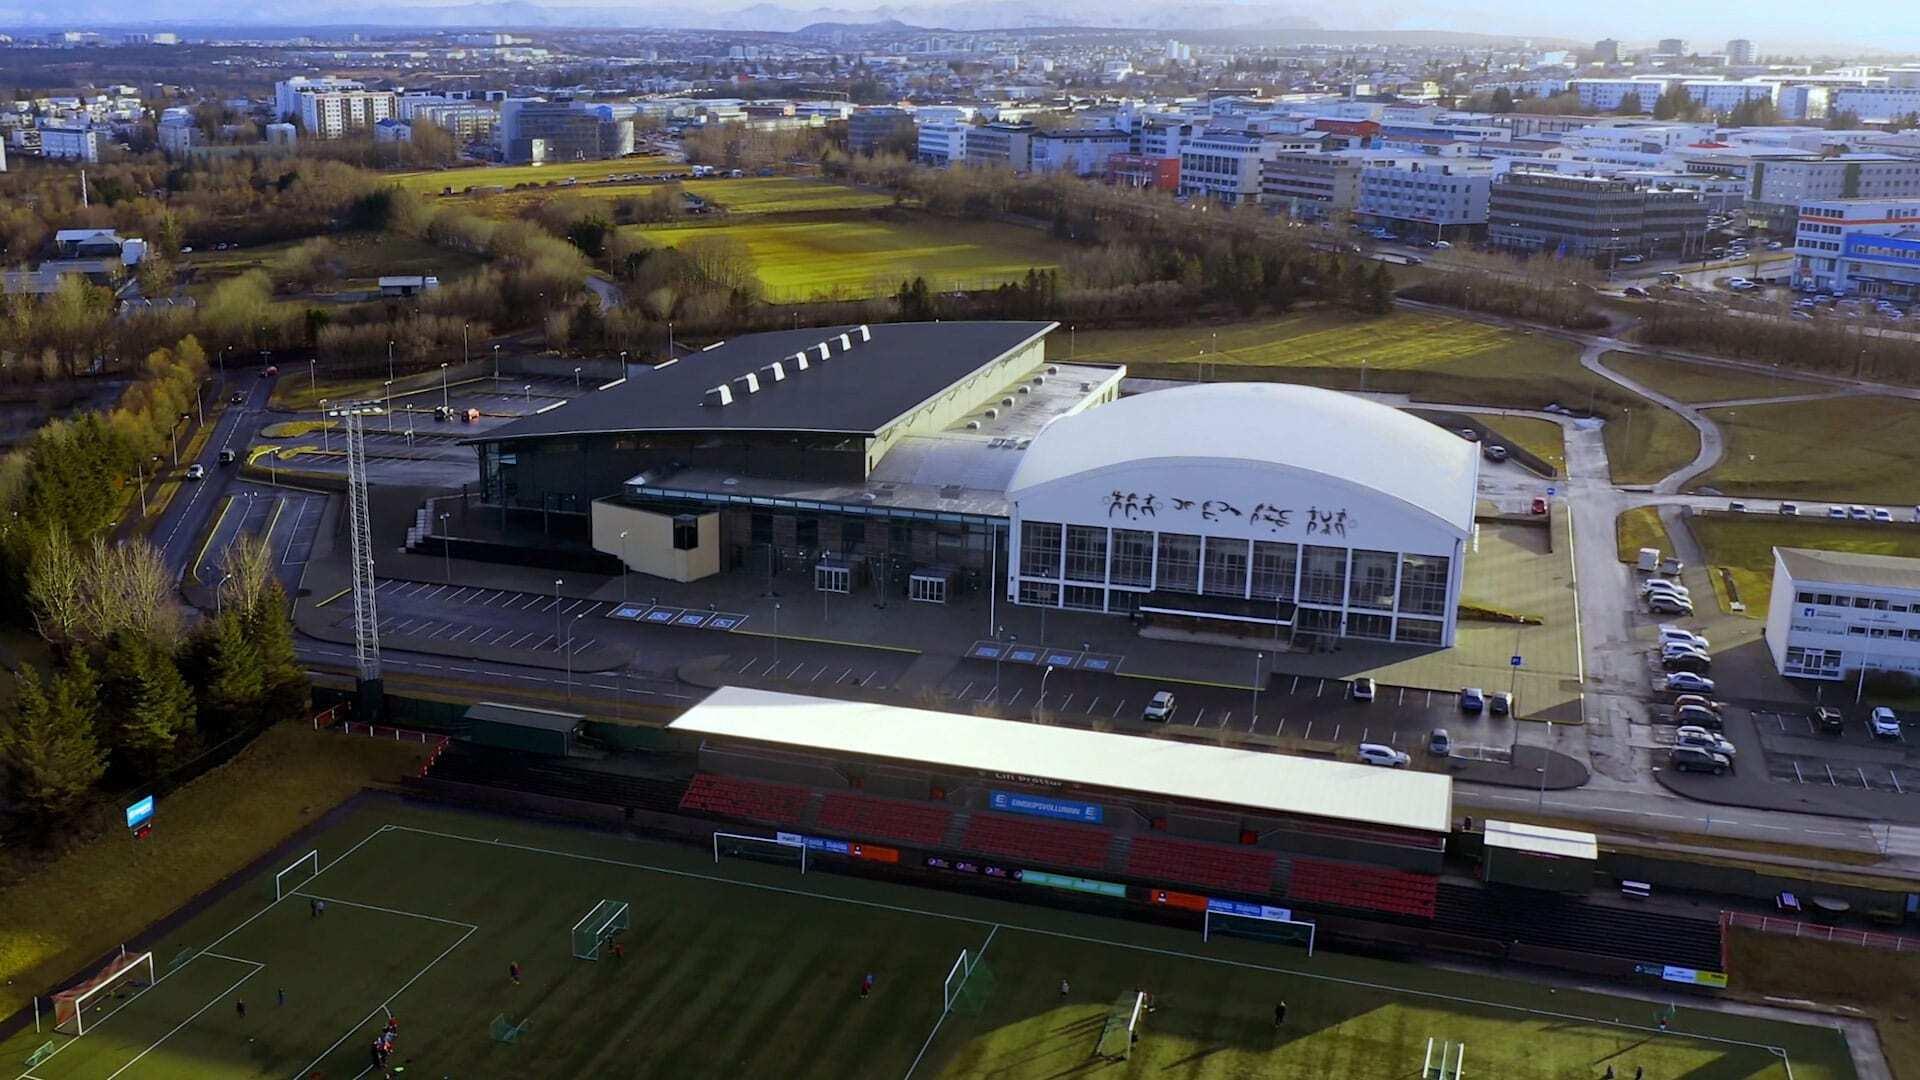 VCT Masters Reykjavik stadium